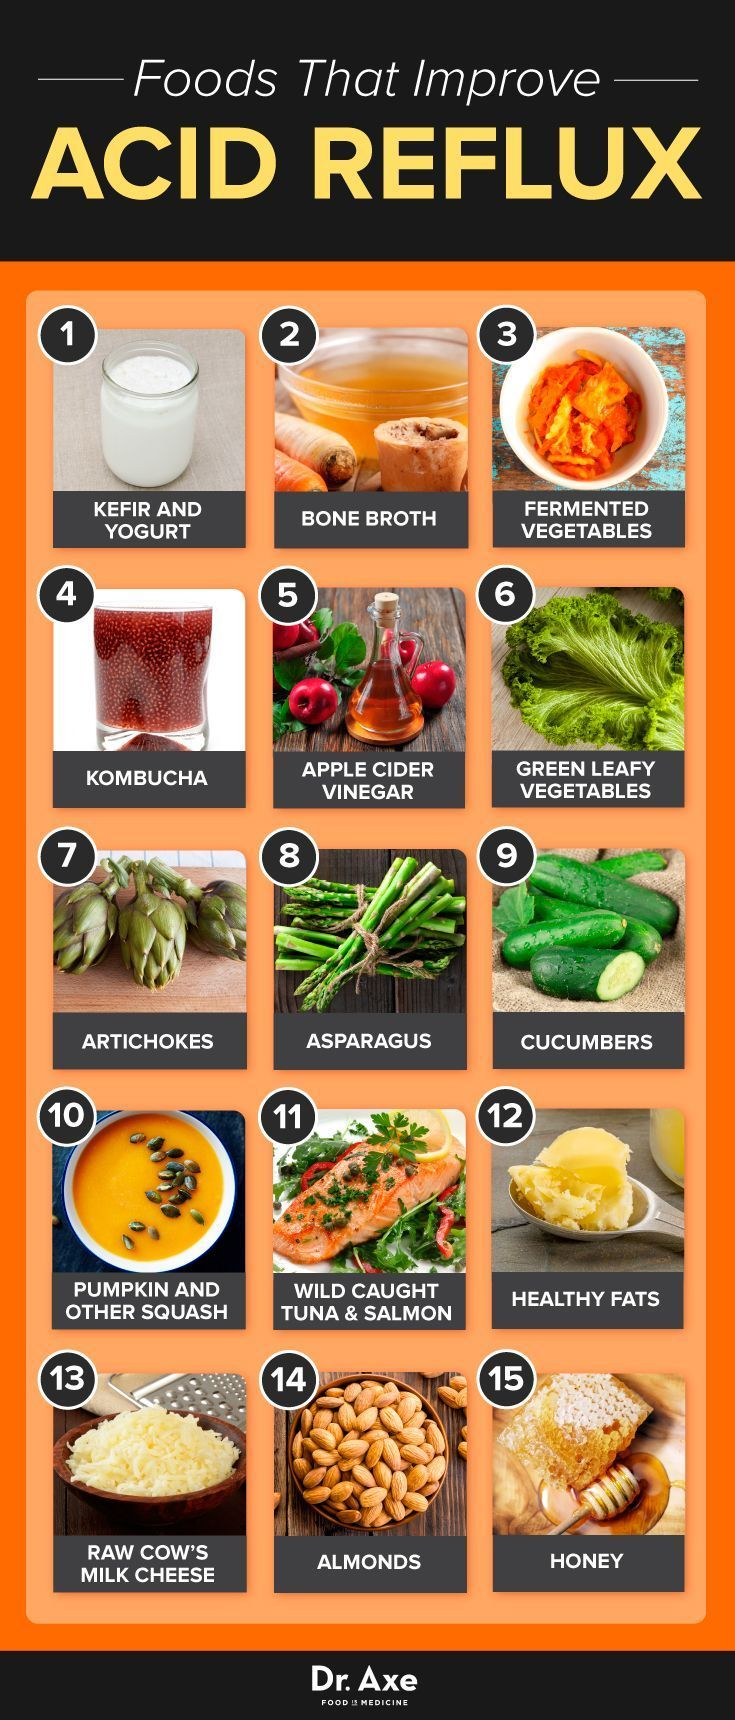 Foods that improve acid reflux symptoms http://www.healingyourwholebody.com/ http://www.exercisefitnesstips.com/